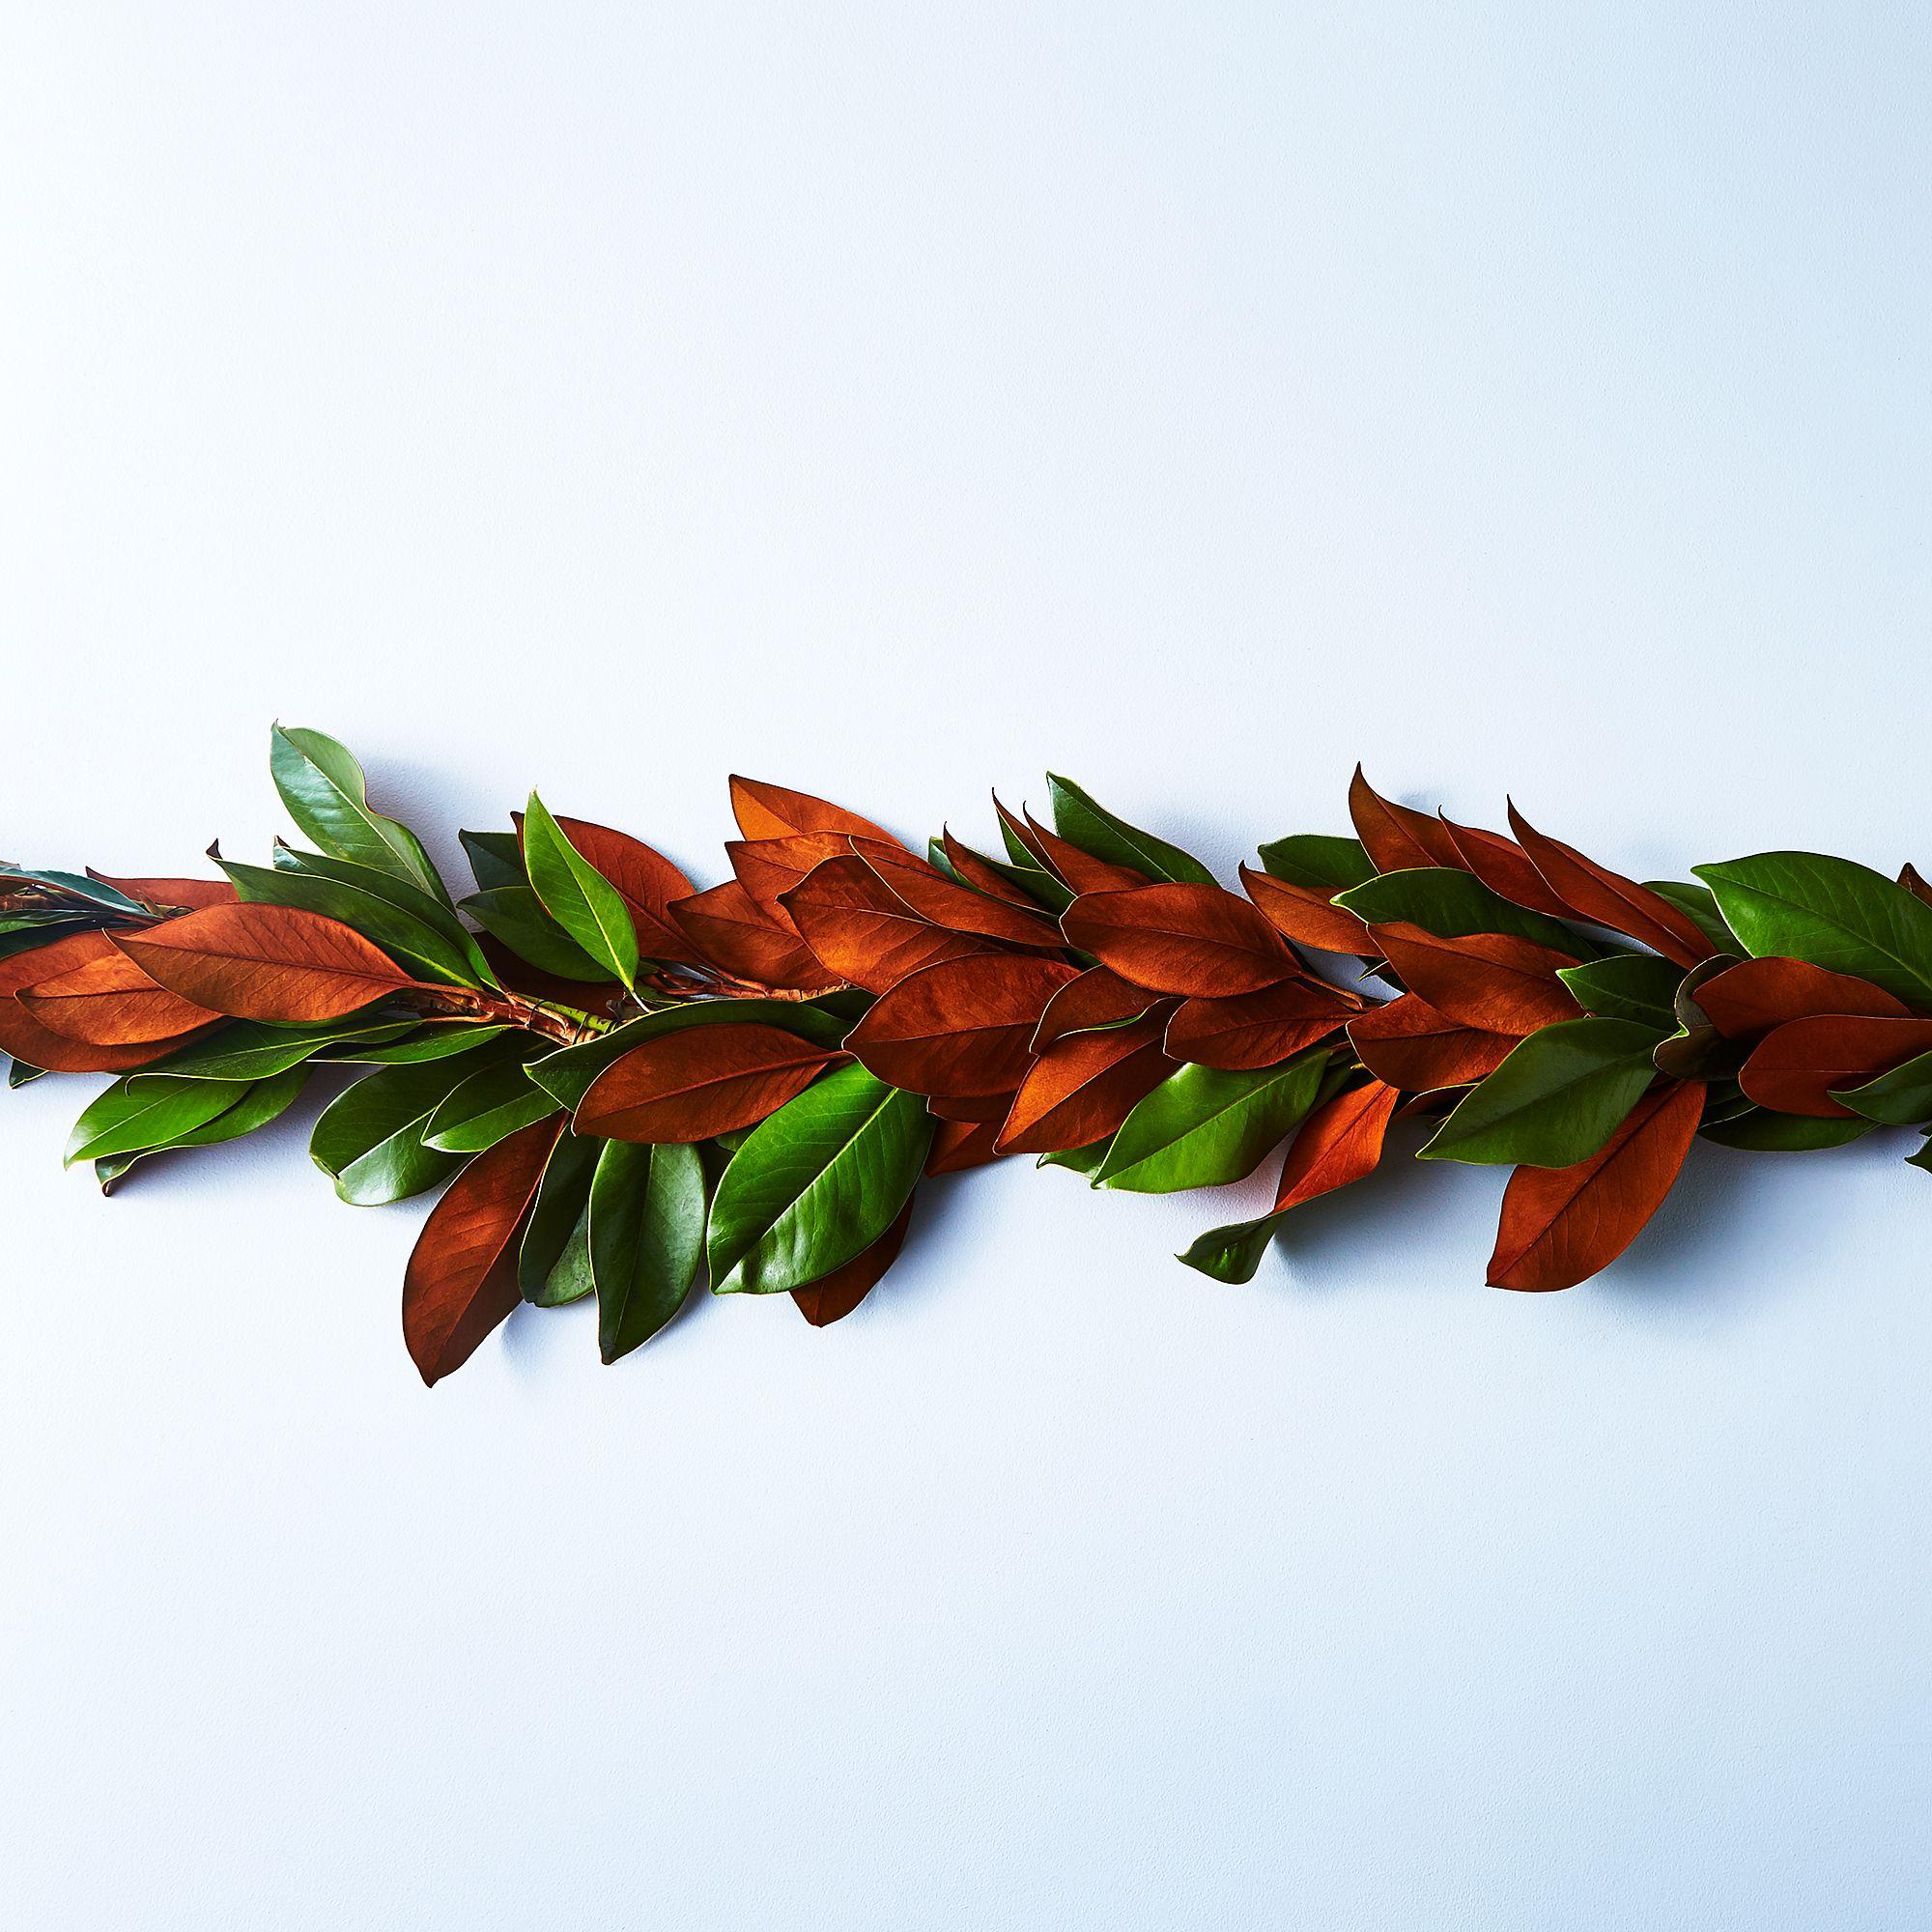 2e85d503 d8e9 4570 a182 e86f2976e05a  2017 0815 creekside farms fall magnolia garland julia gartland 36013